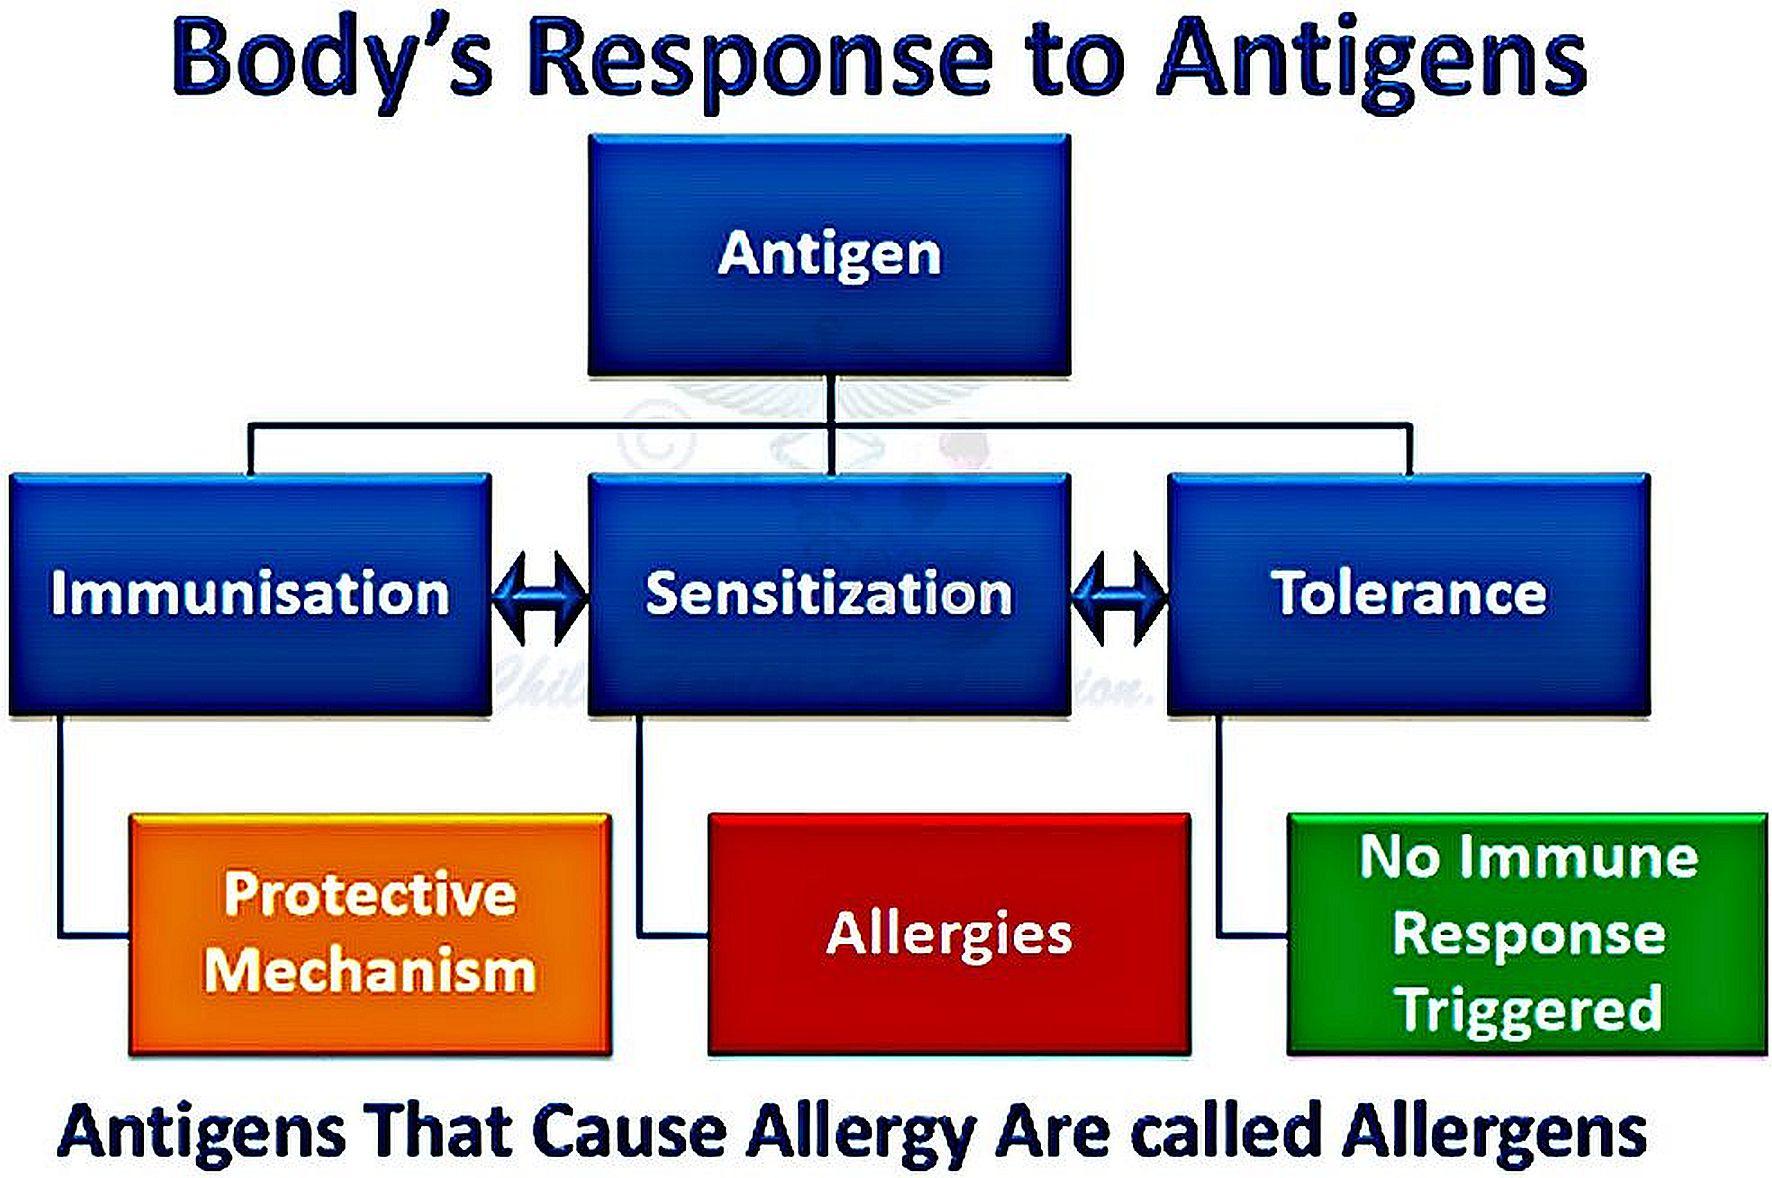 Body's Response to Antigens